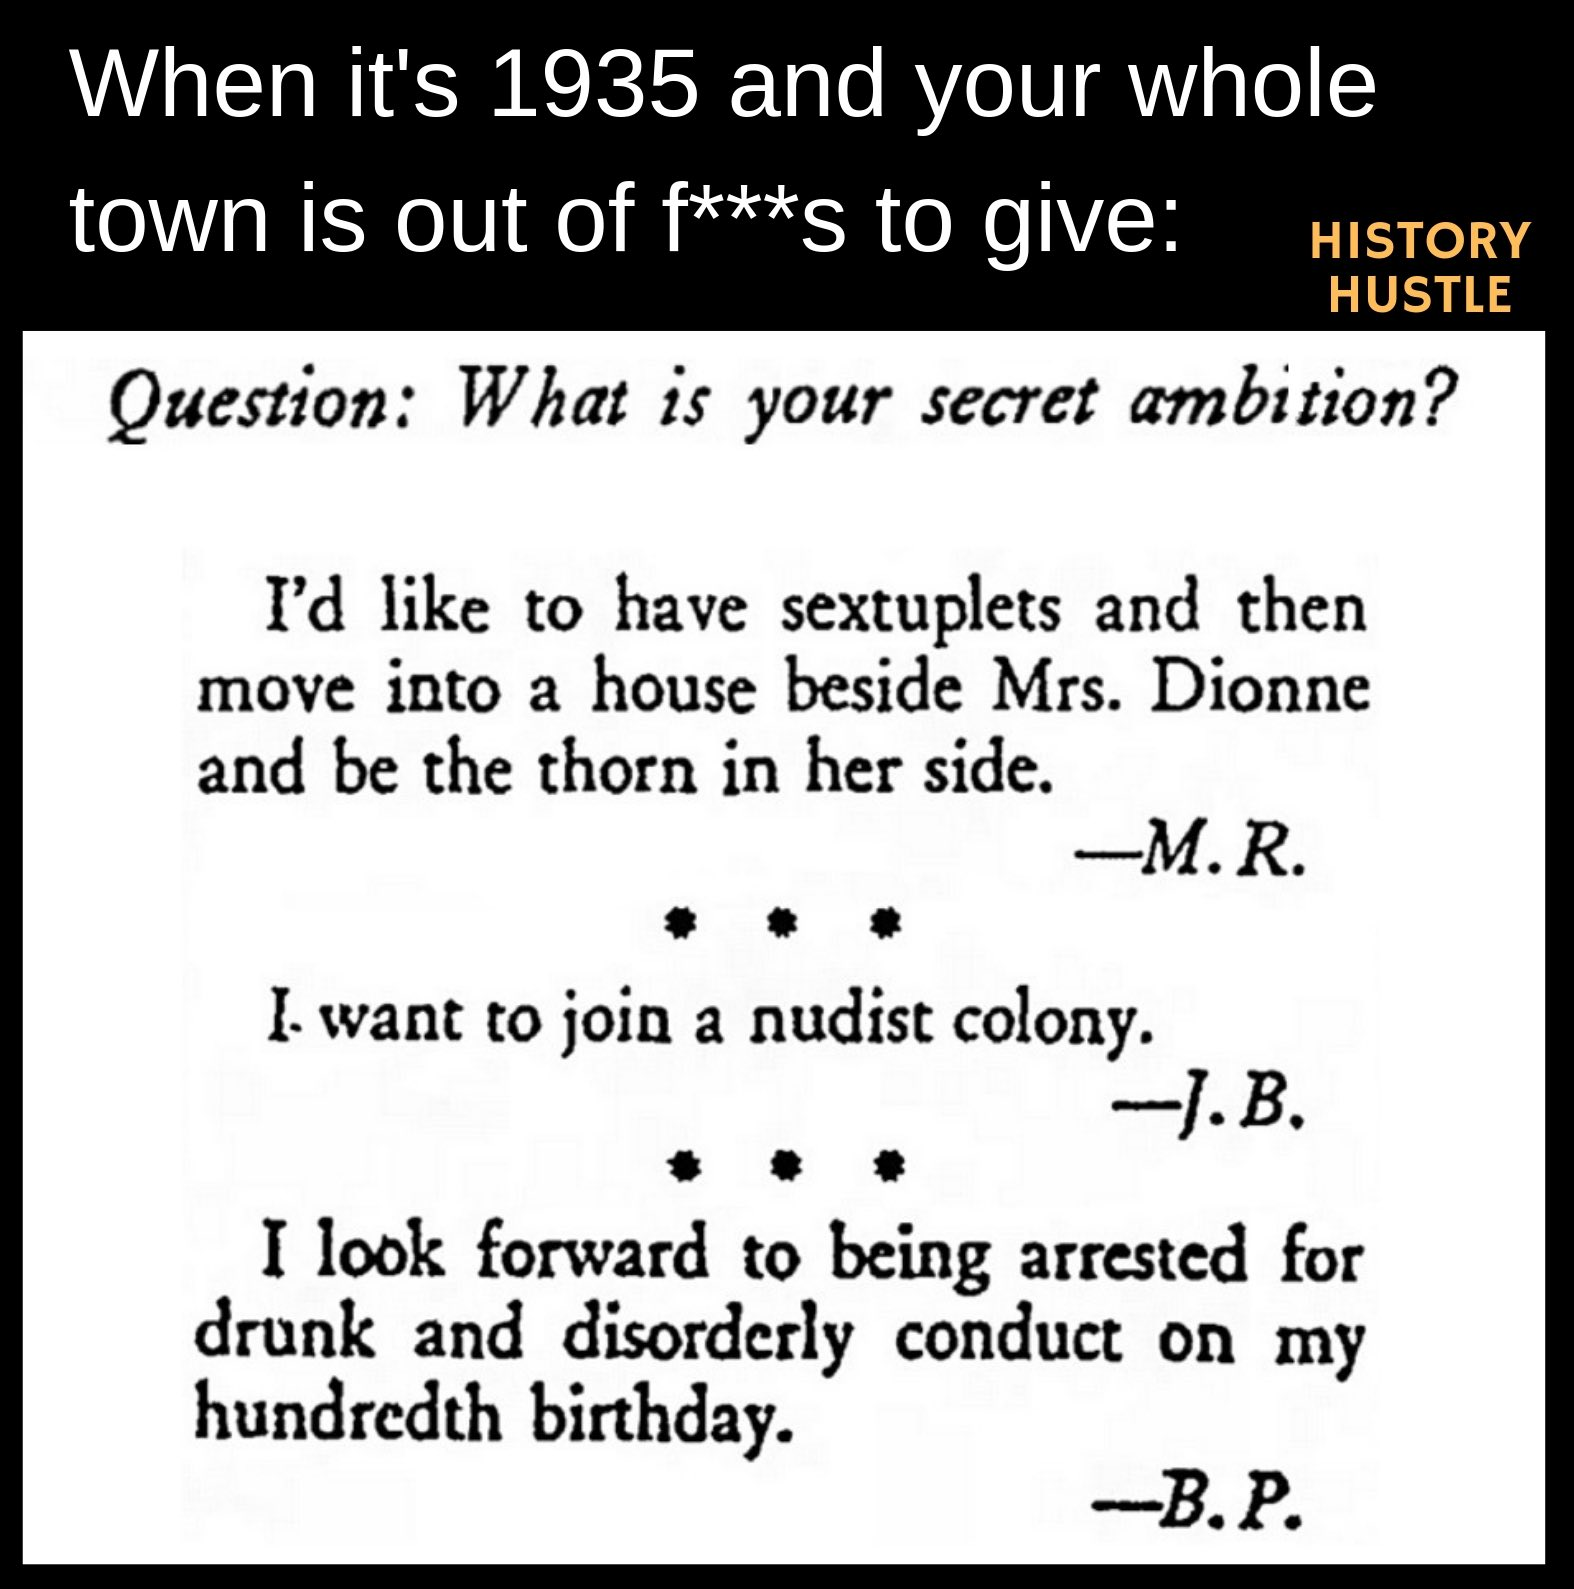 History Hustle secret ambition meme image